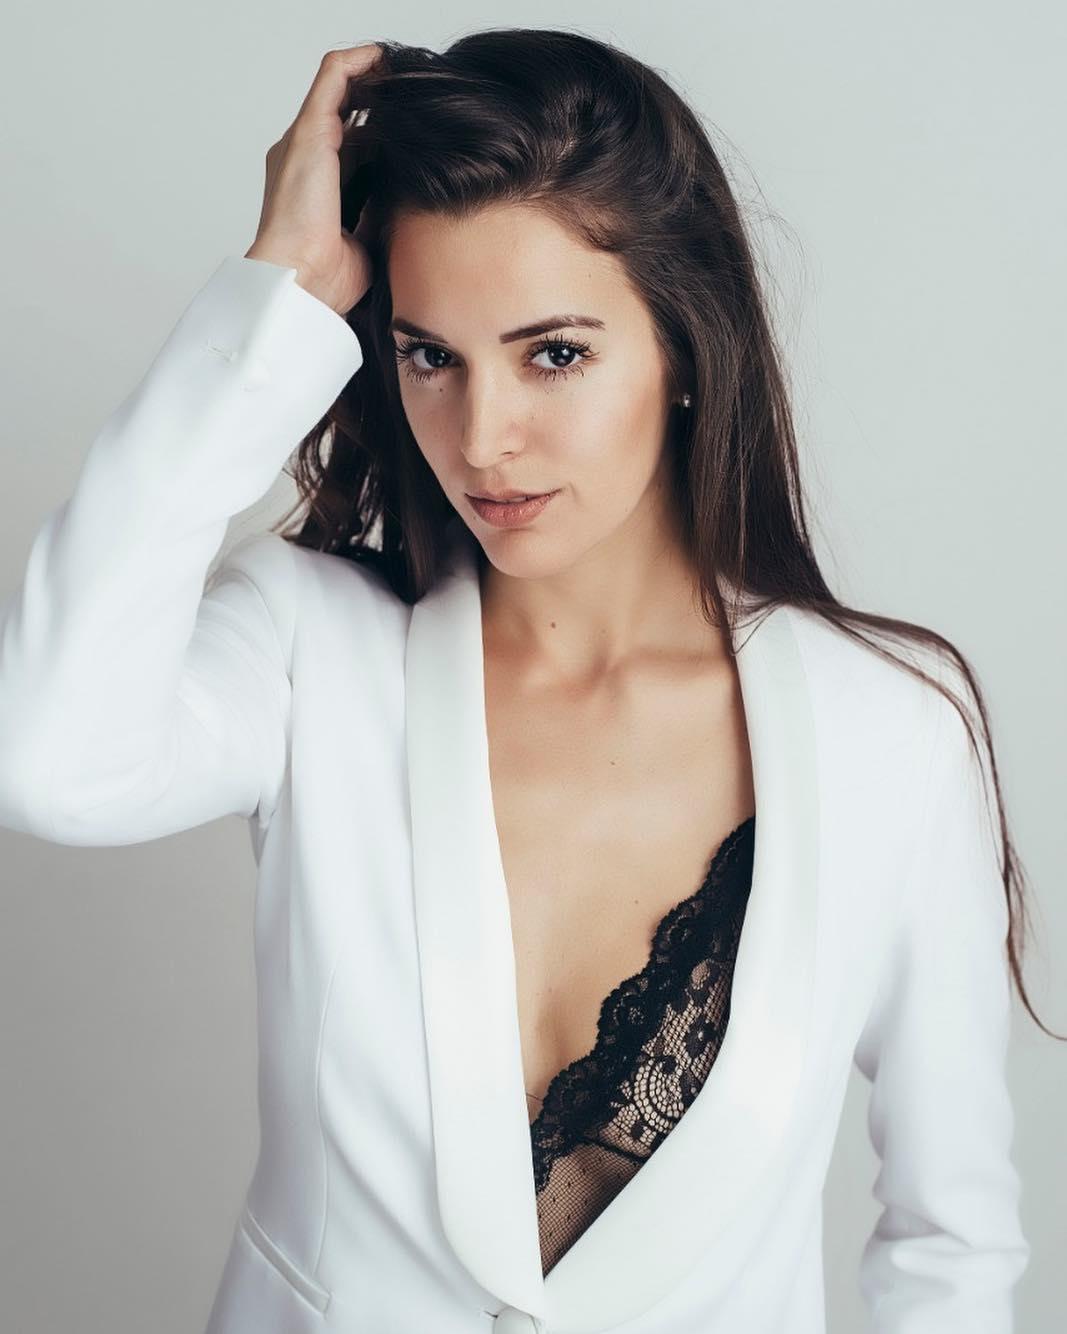 Paola Revelli